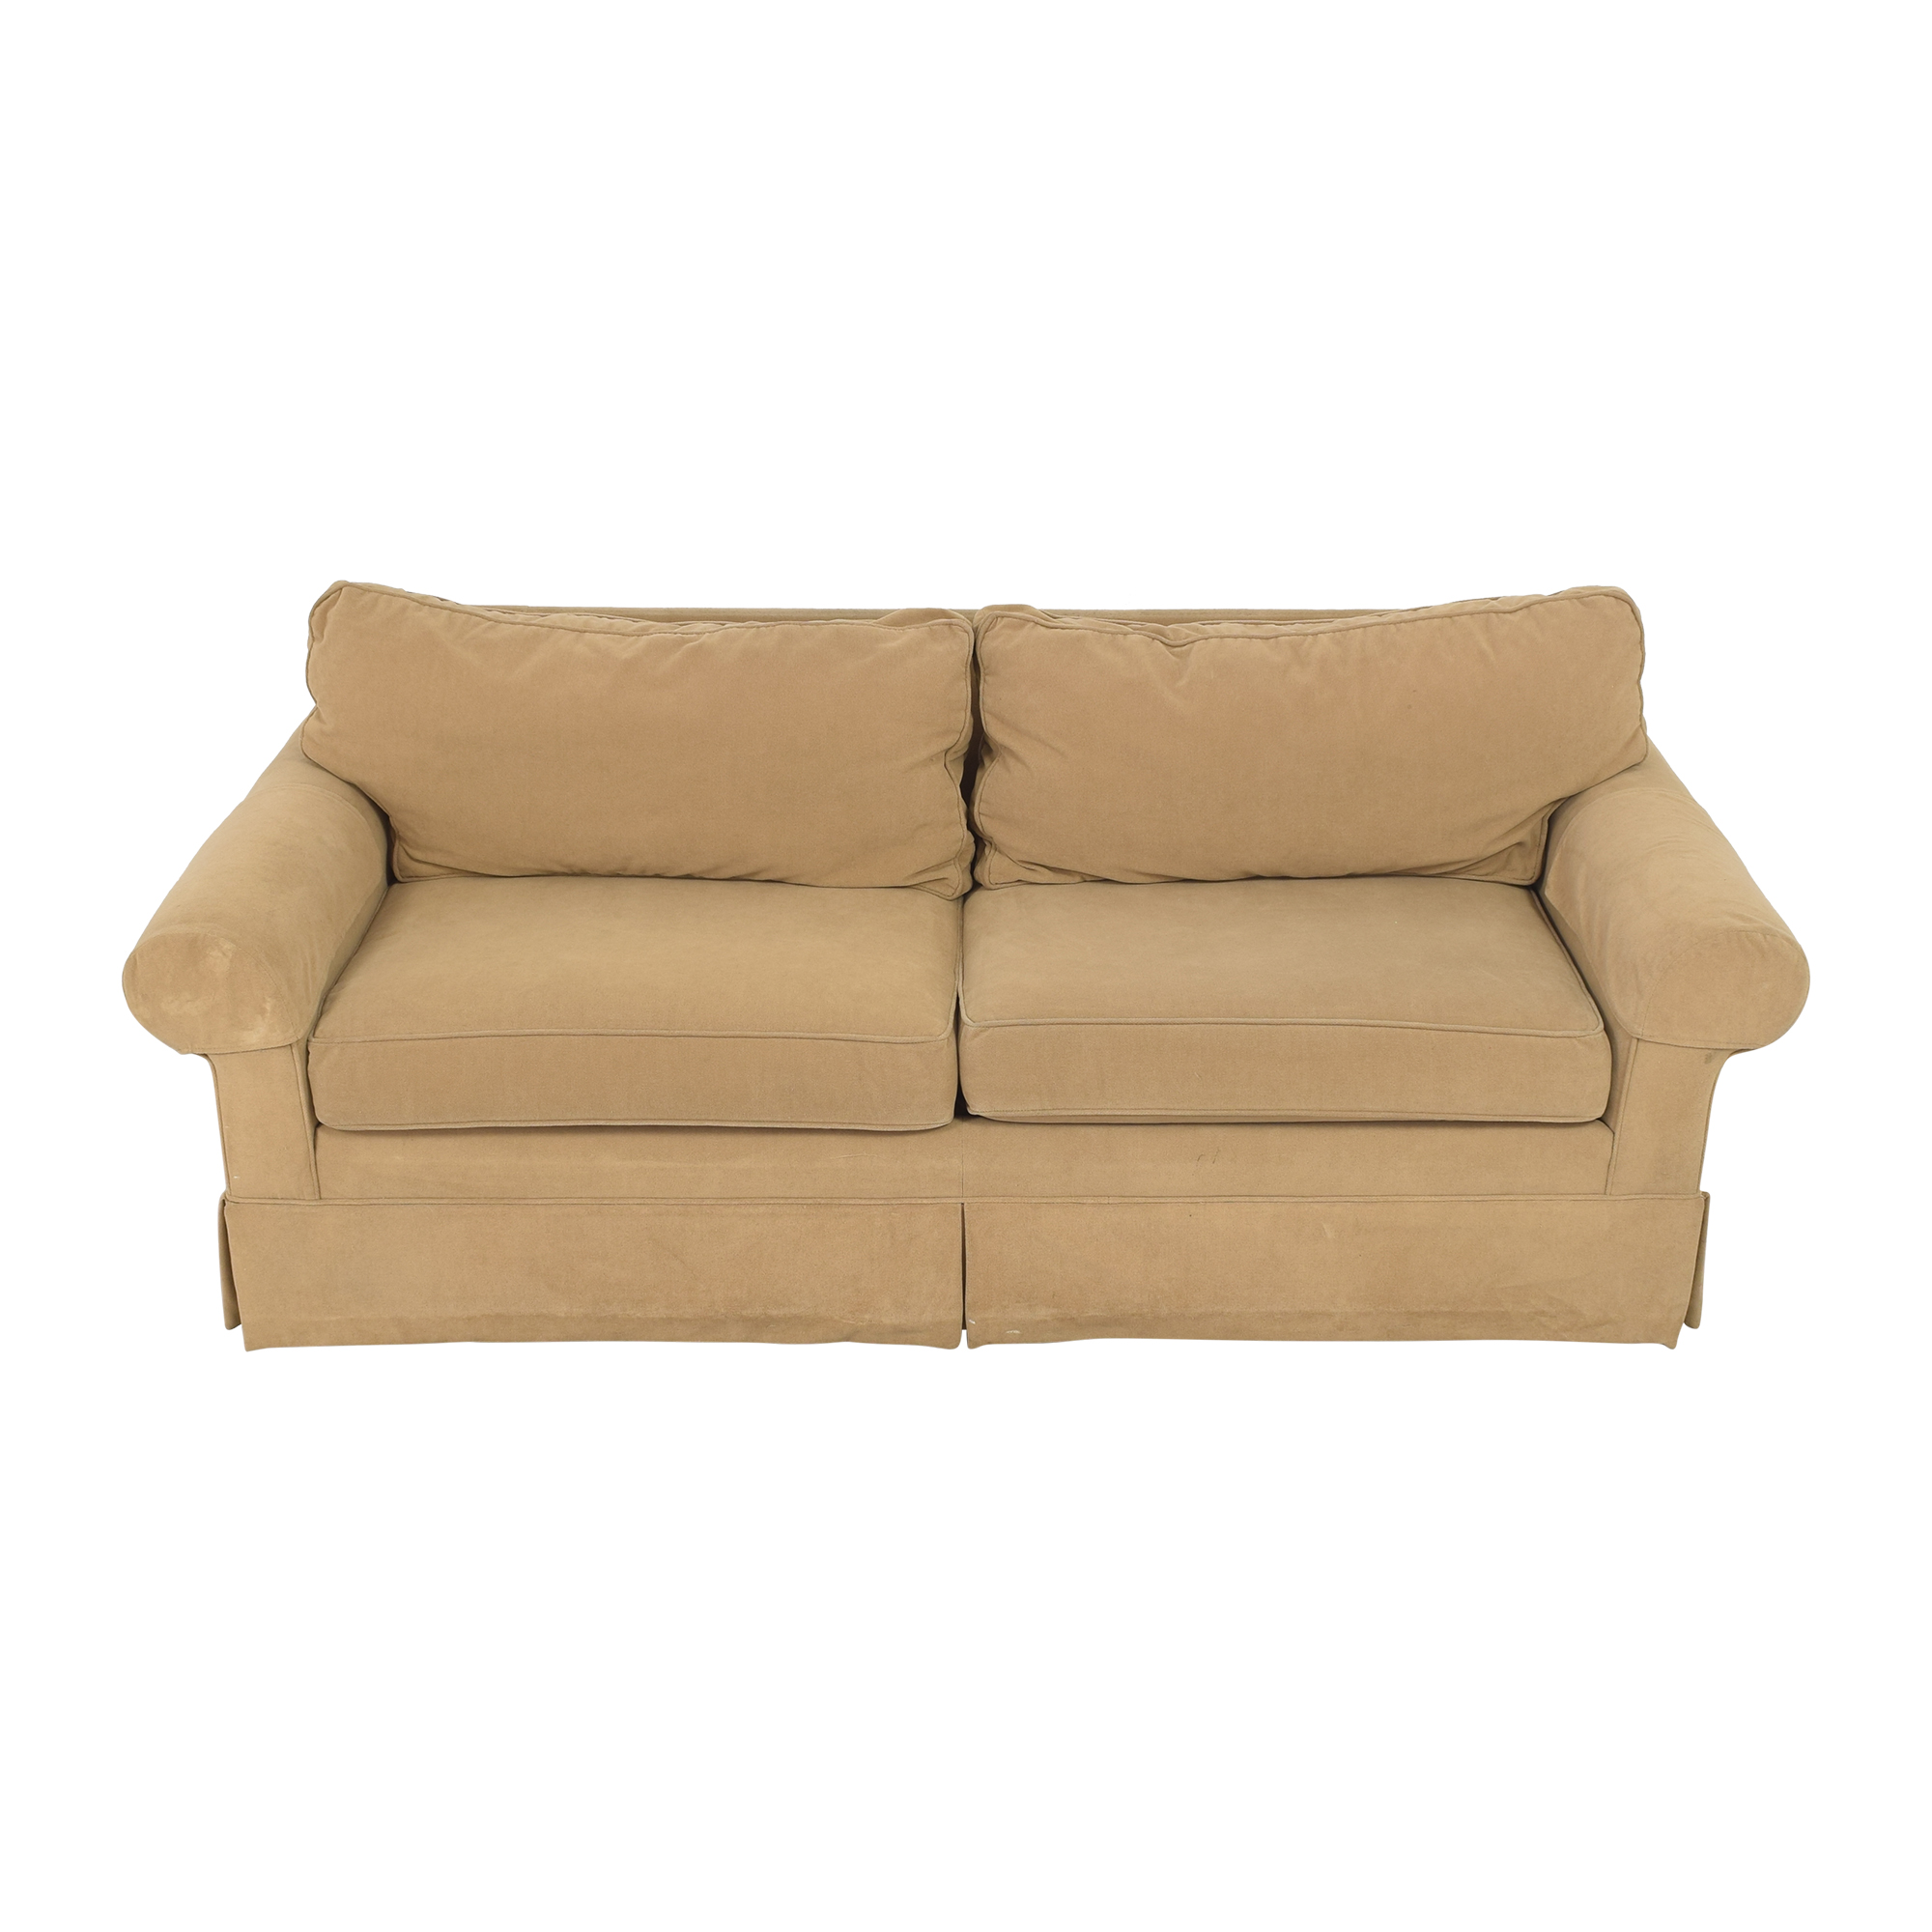 Ethan Allen Ethan Allen Skirted Roll Arm Sofa discount